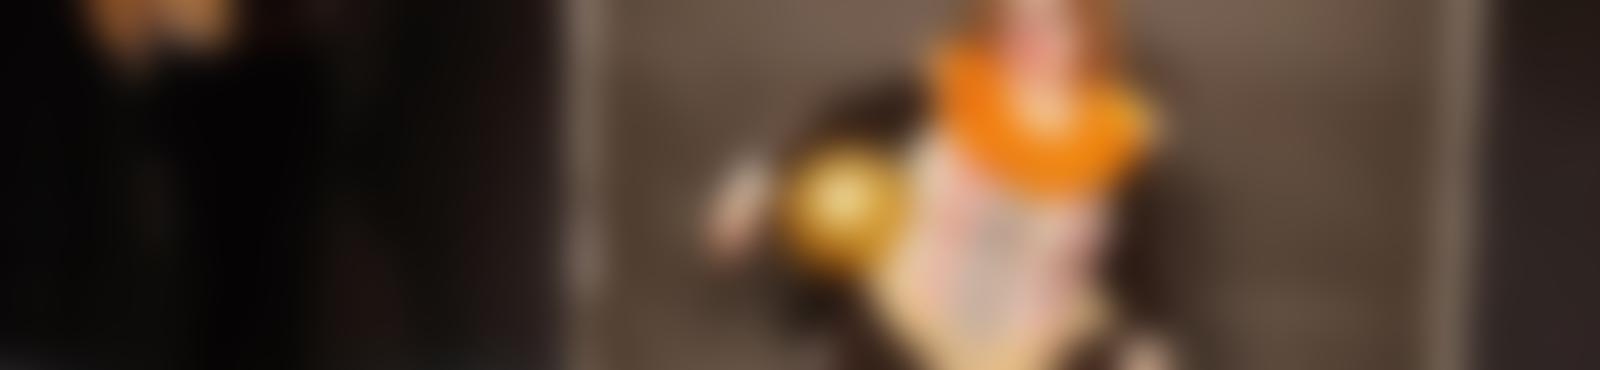 Blurred 80fe0363 6804 4b49 ad09 567f41aa6153